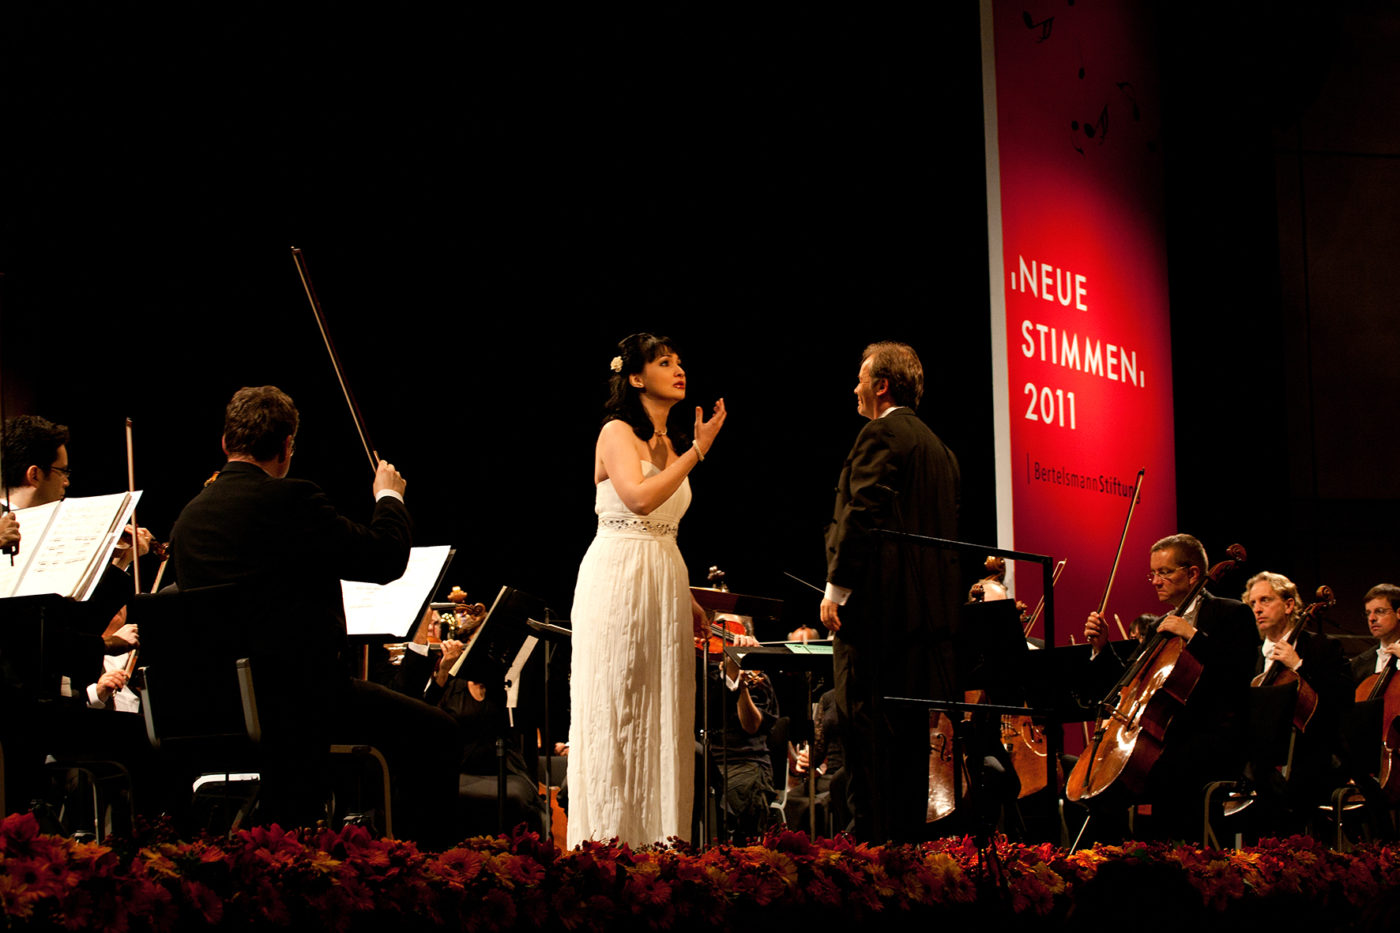 Neue Stimmen: Christine A. Pasaroiu / Foto @ Thomas Kunsch